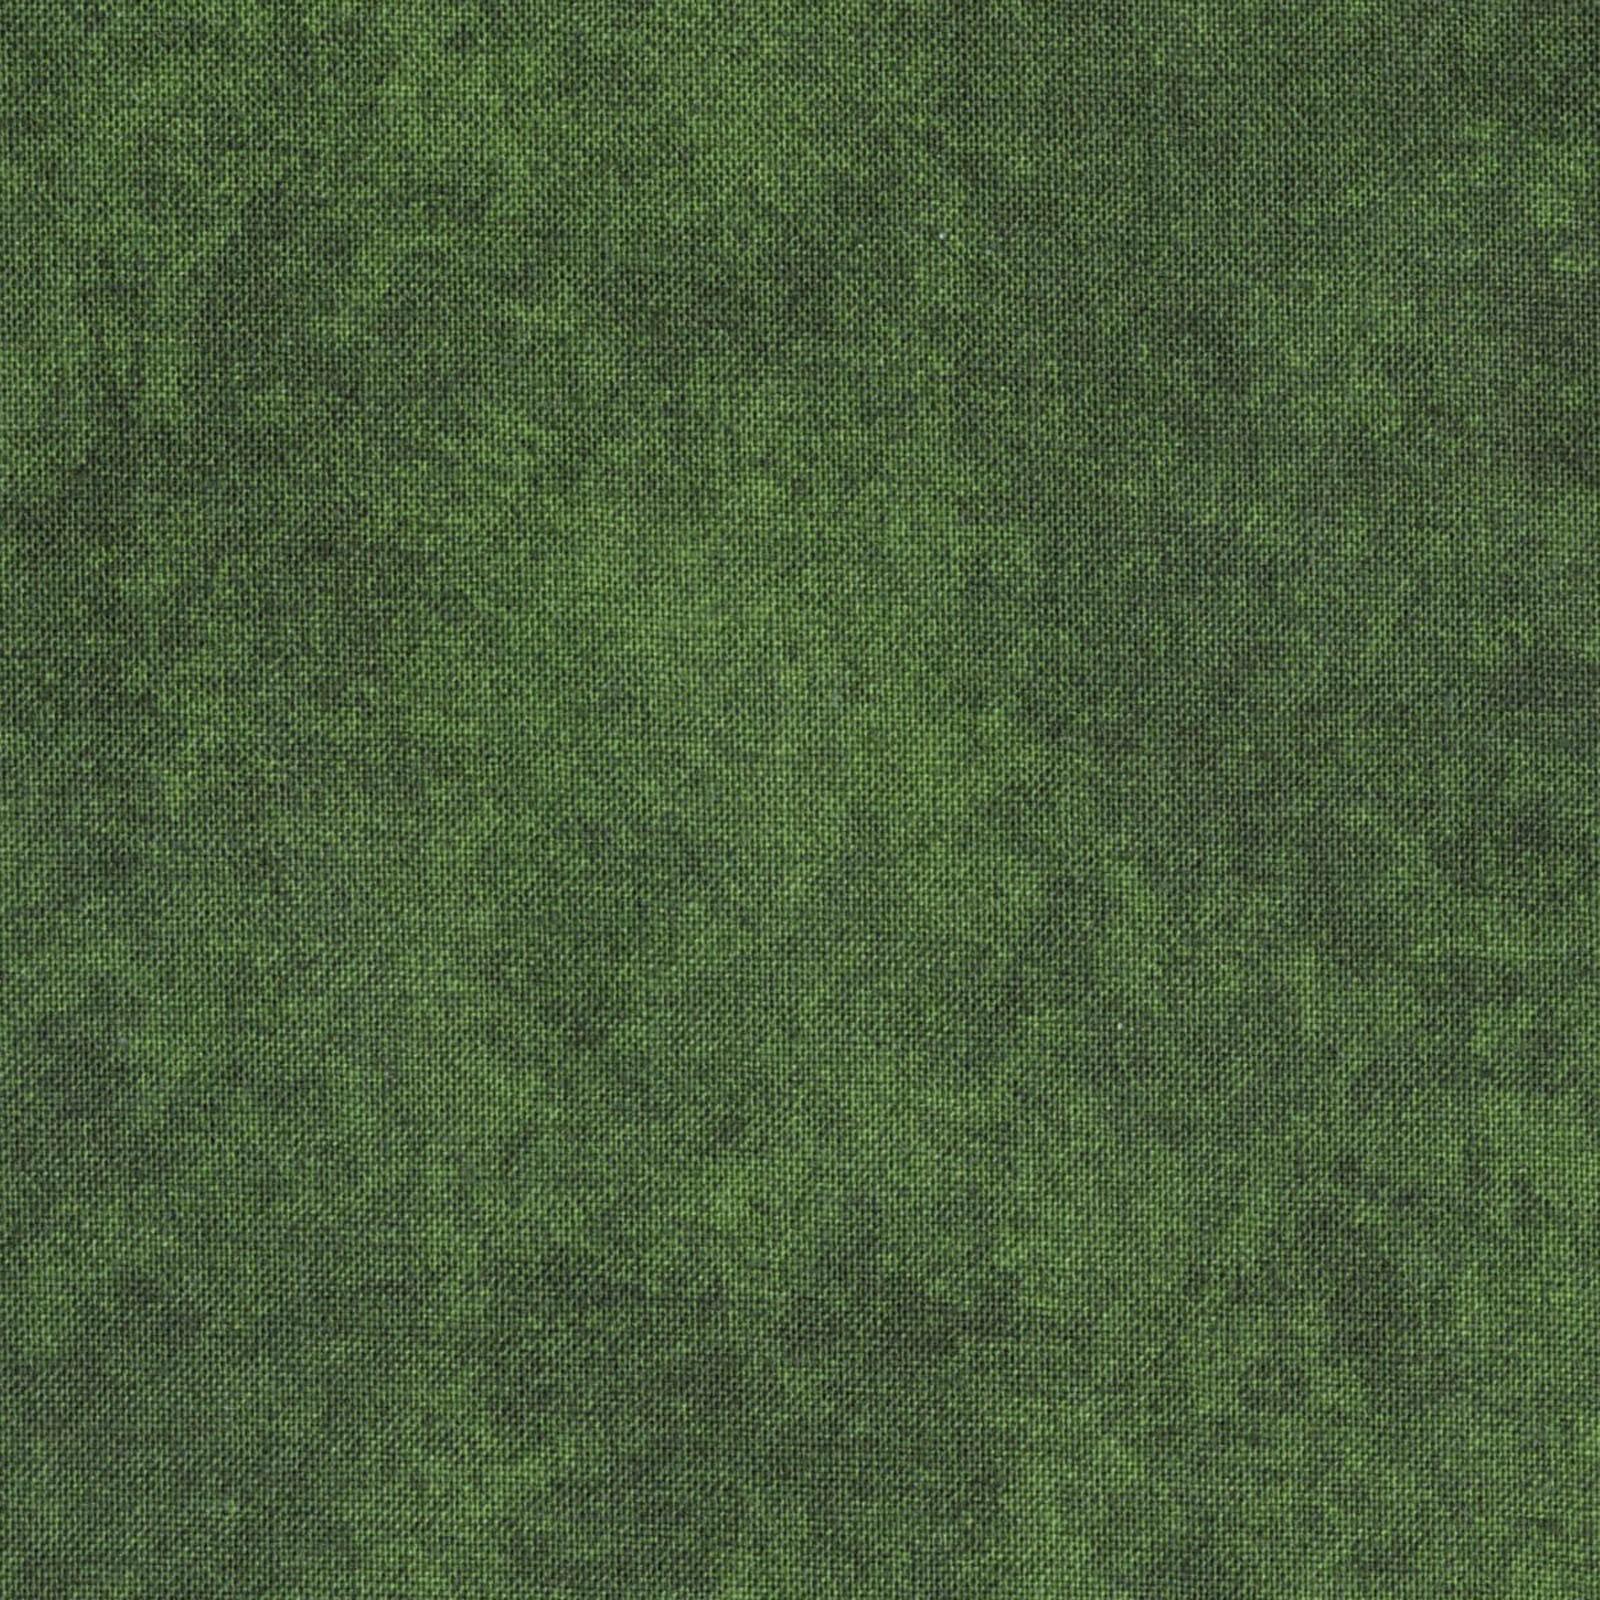 Maywood Shadow Play MAS513-GX Green Marble